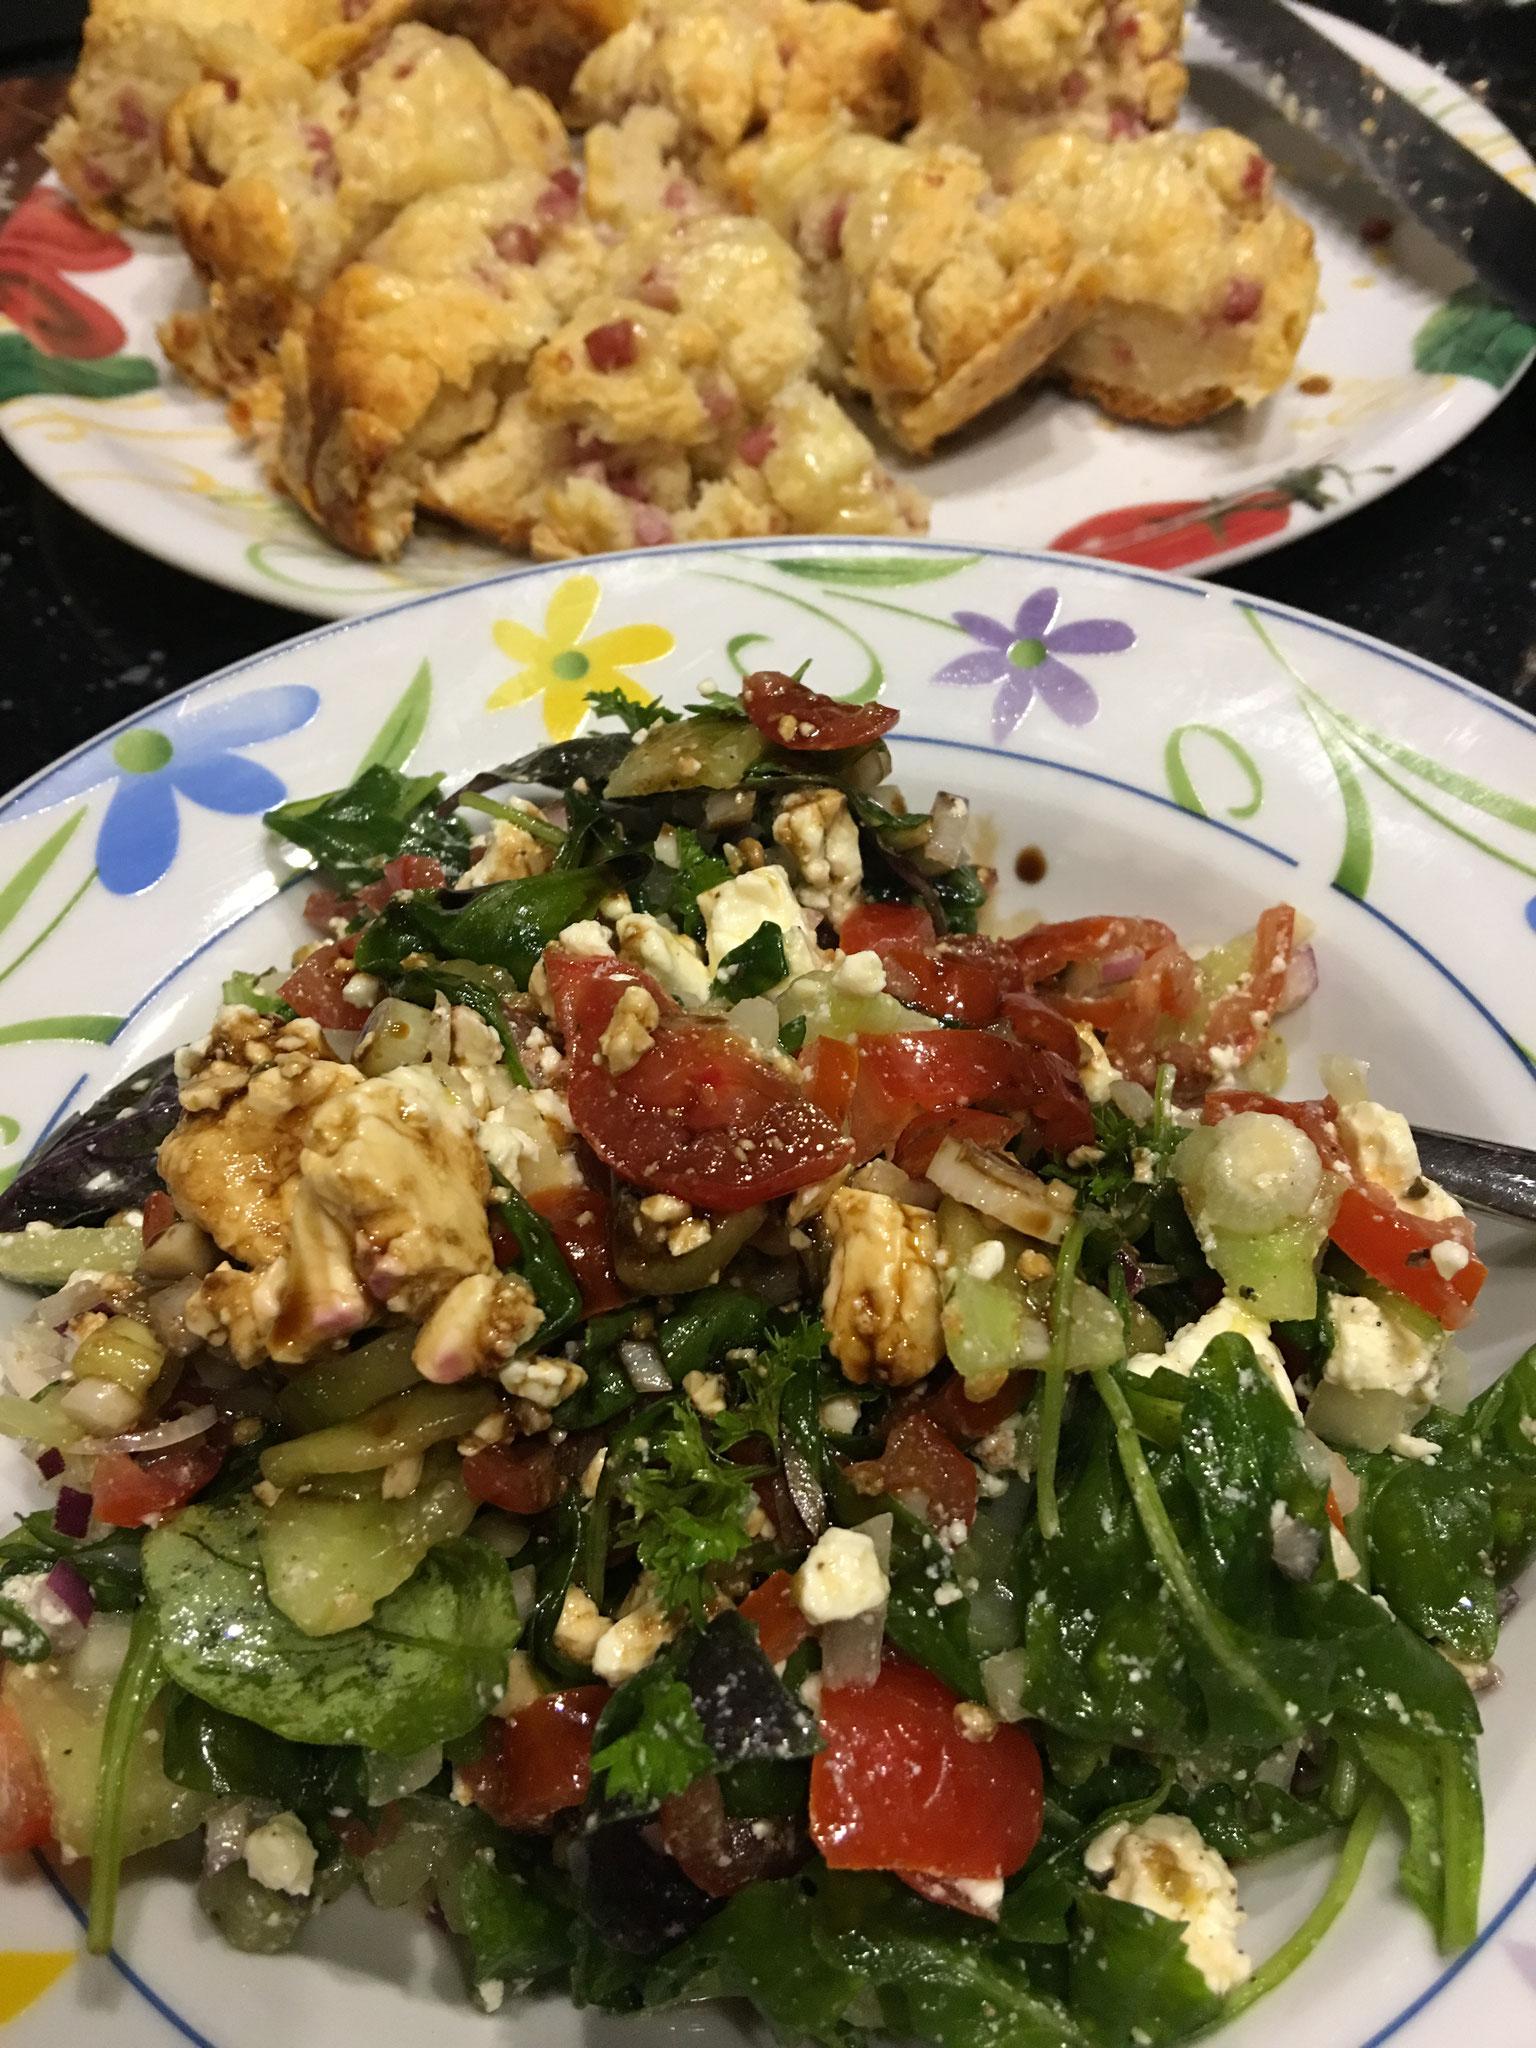 Käse-Schinken Brot mit Salat